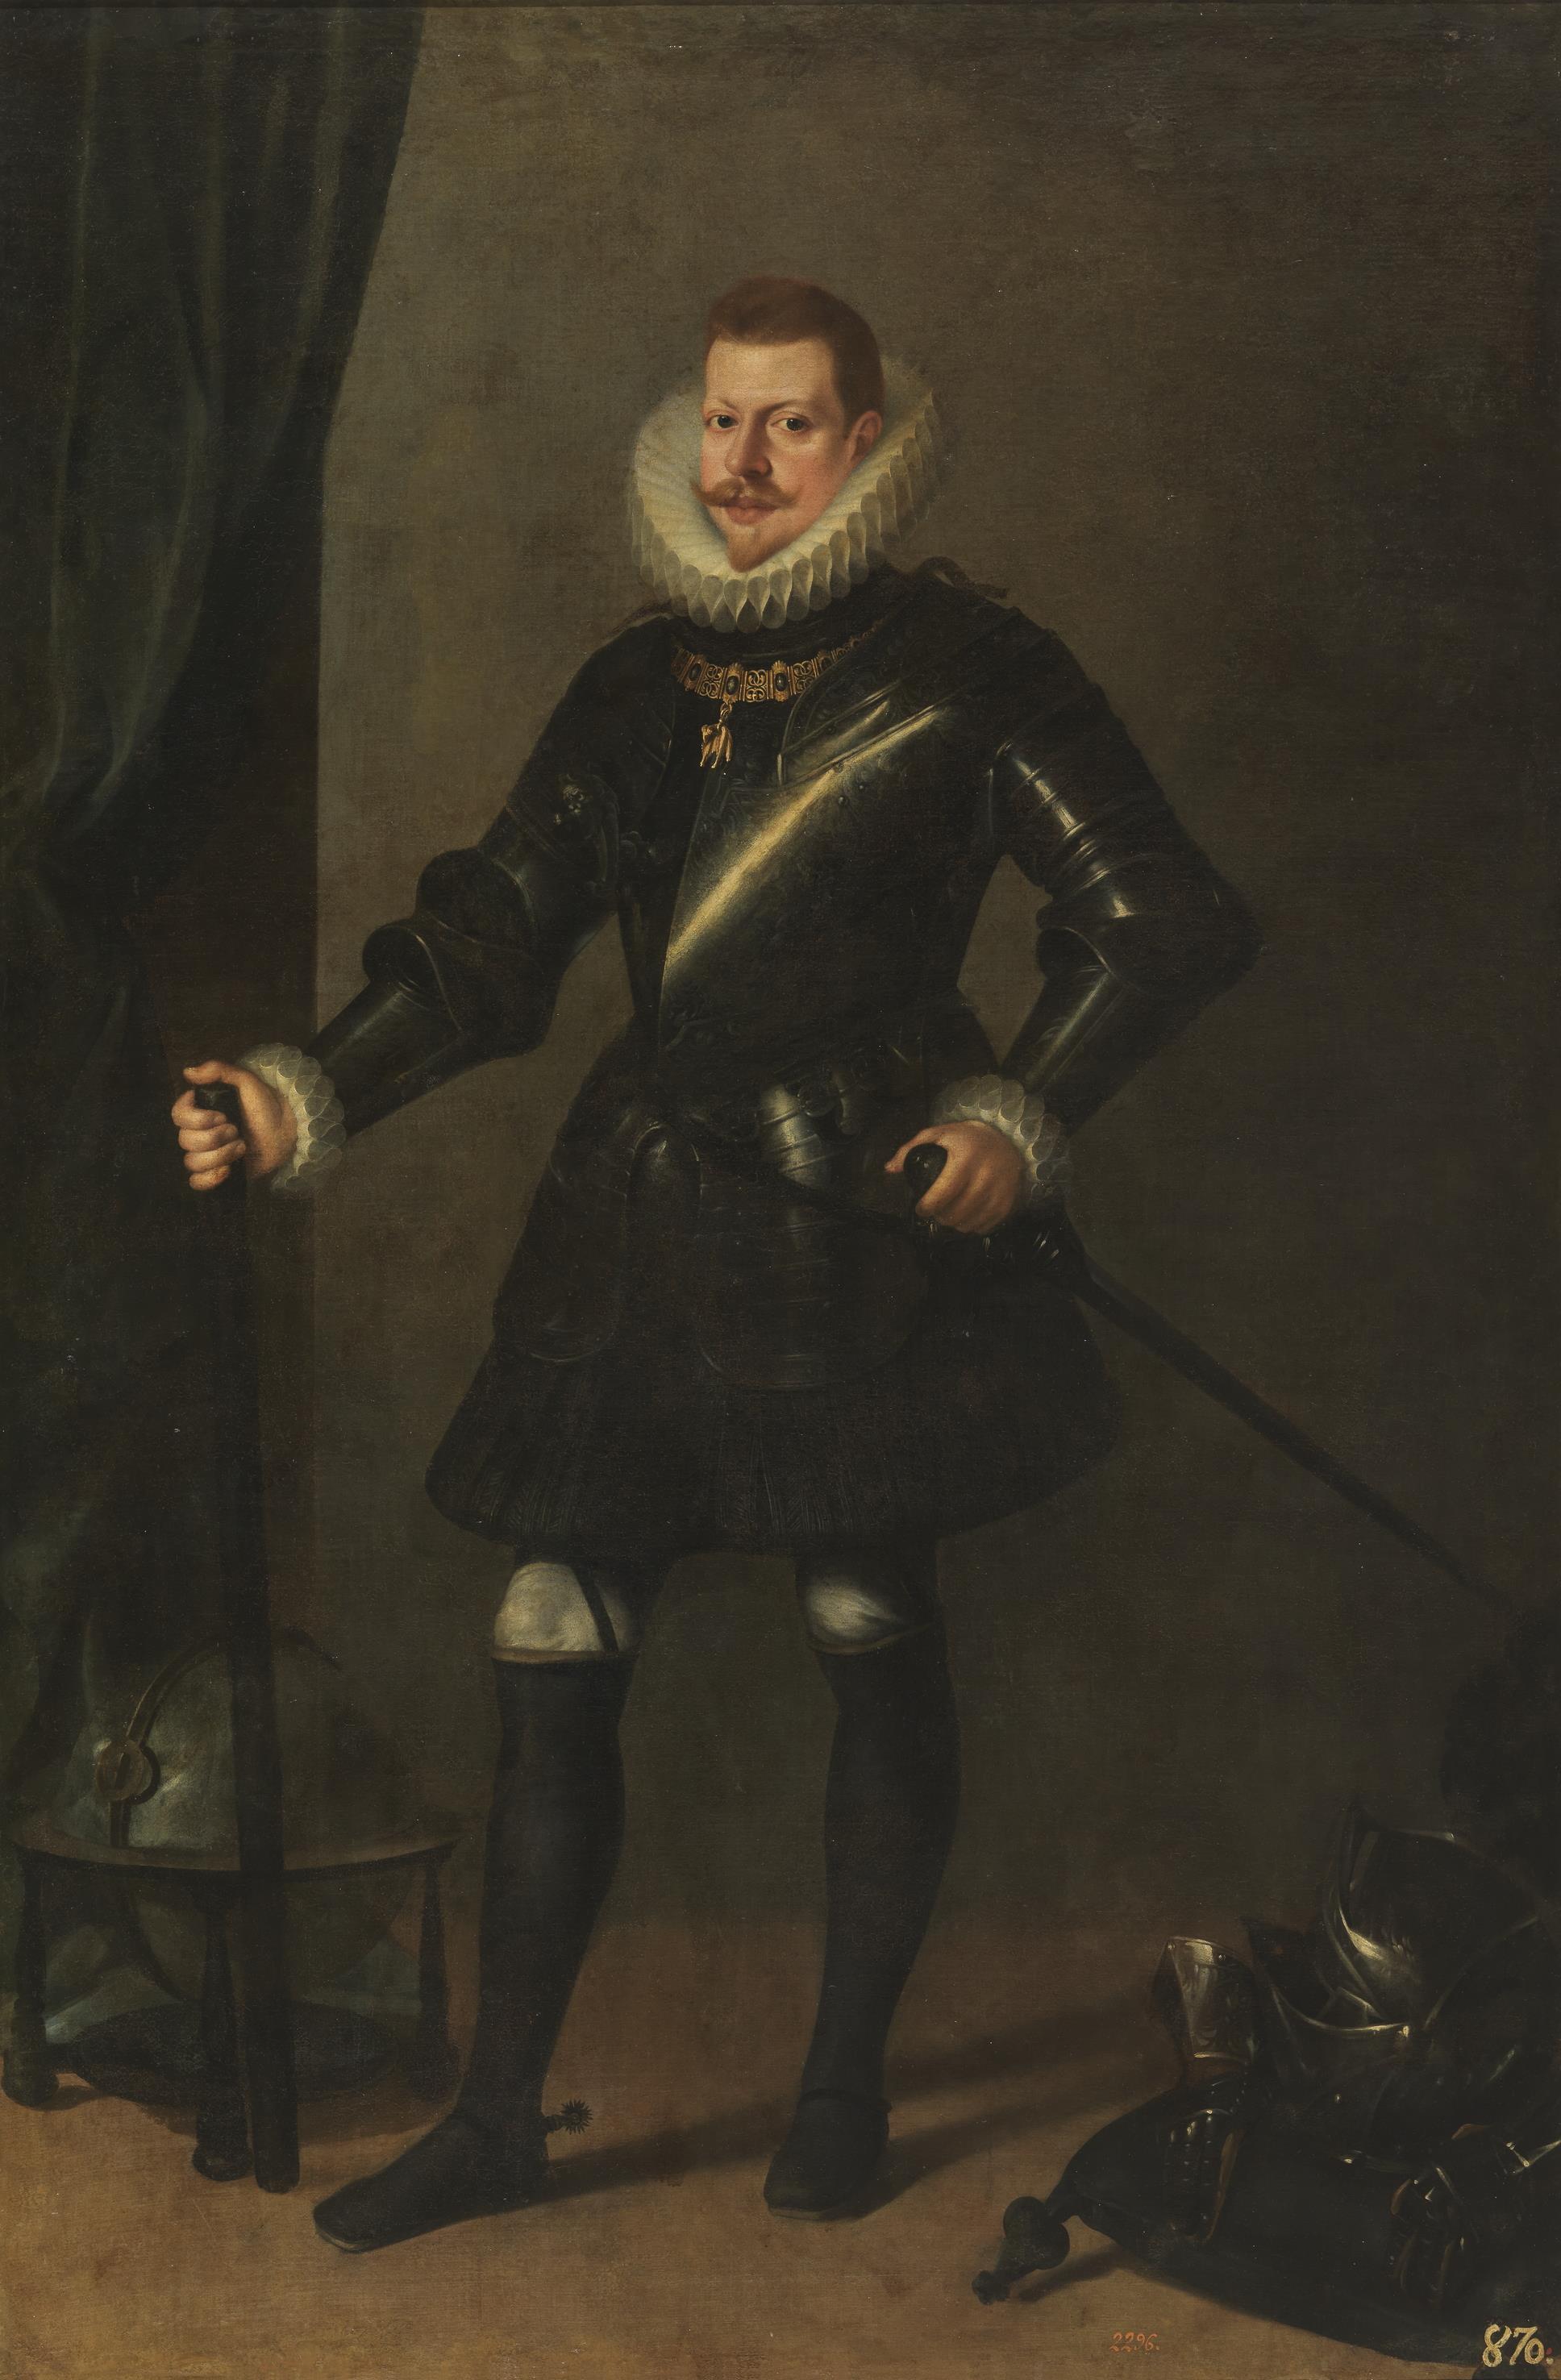 http://upload.wikimedia.org/wikipedia/commons/3/39/Felipe-III-de-Espana_A-Vidal.jpg